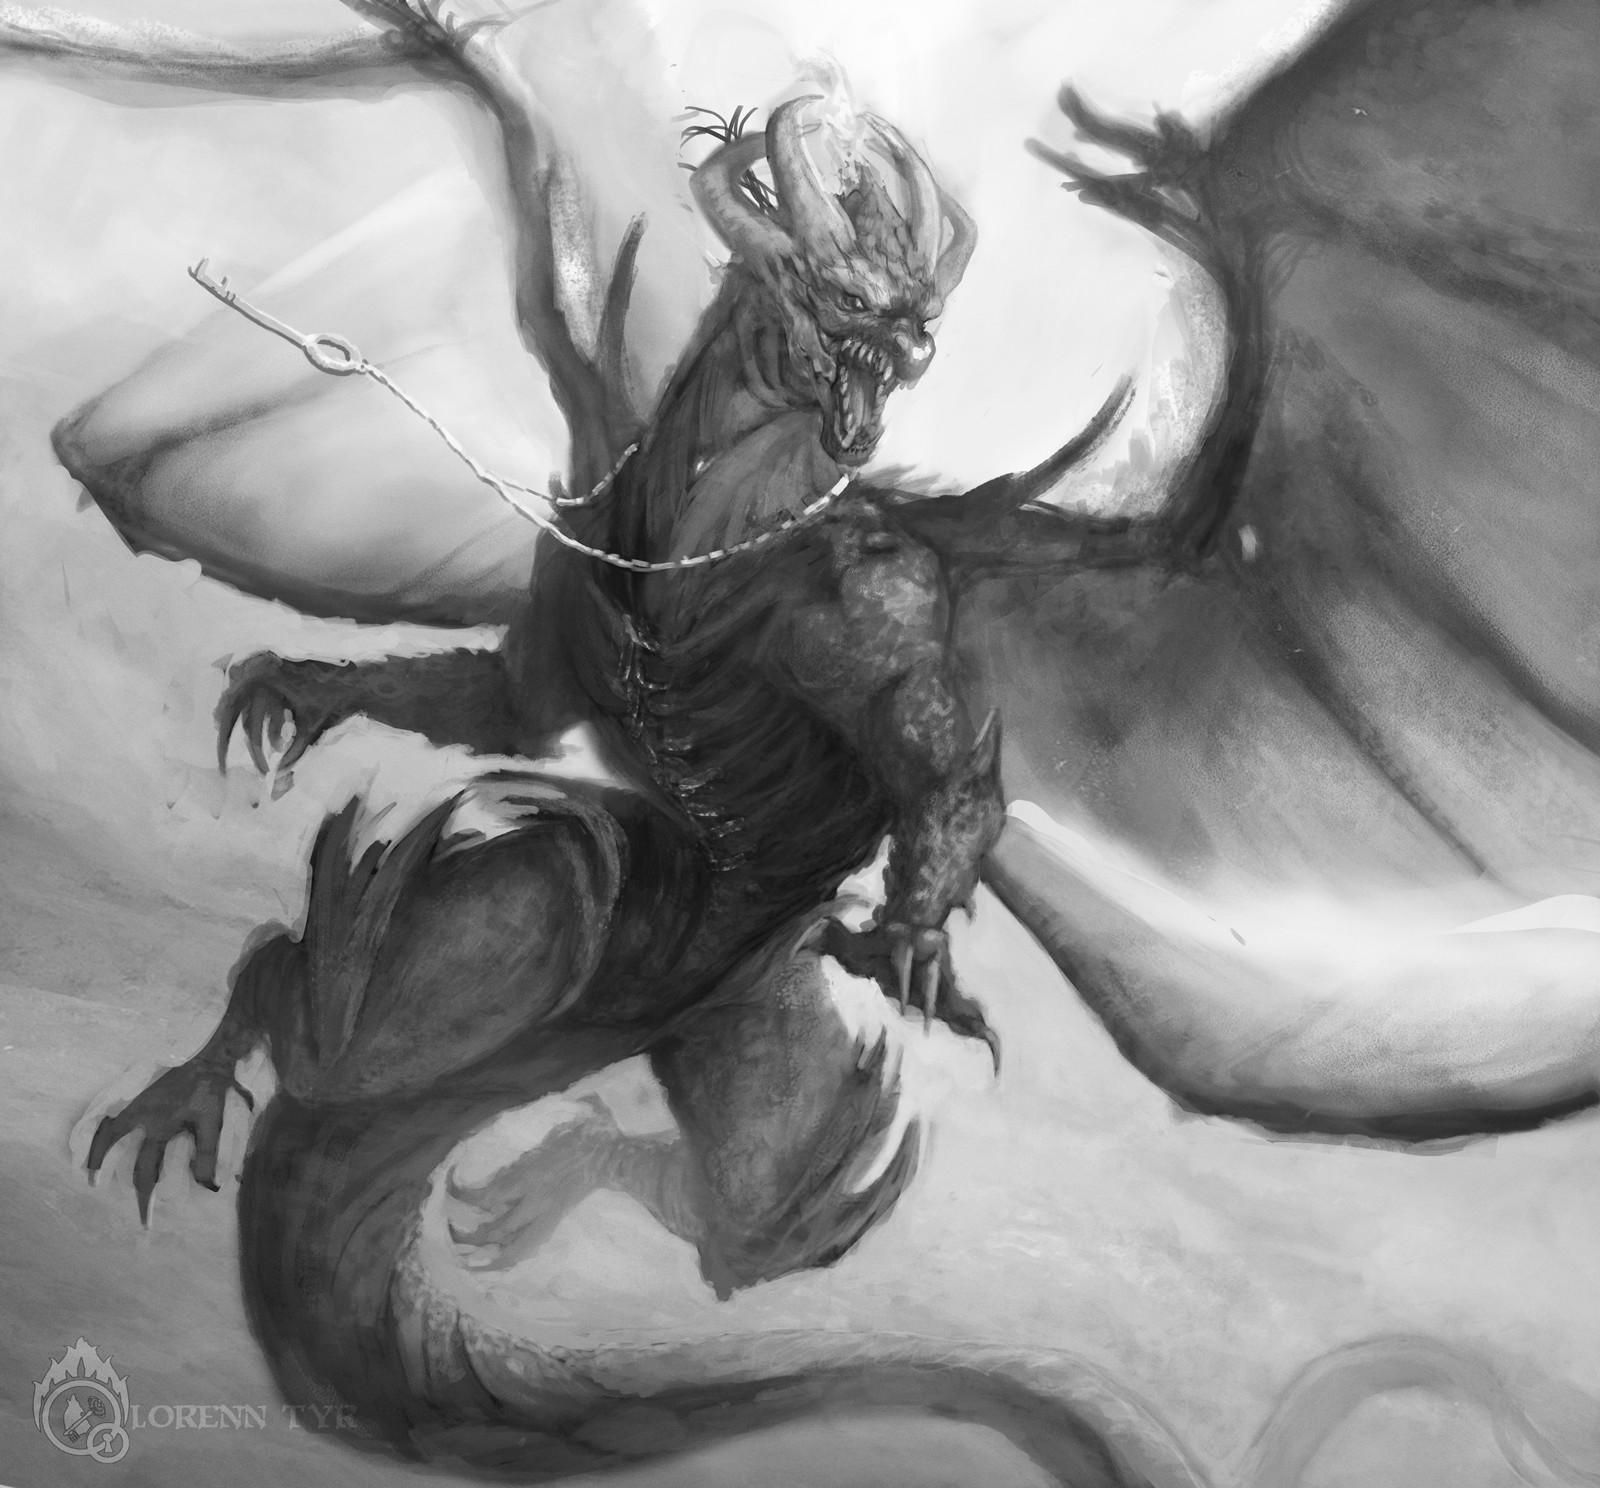 Lorenn tyr dragon poemas